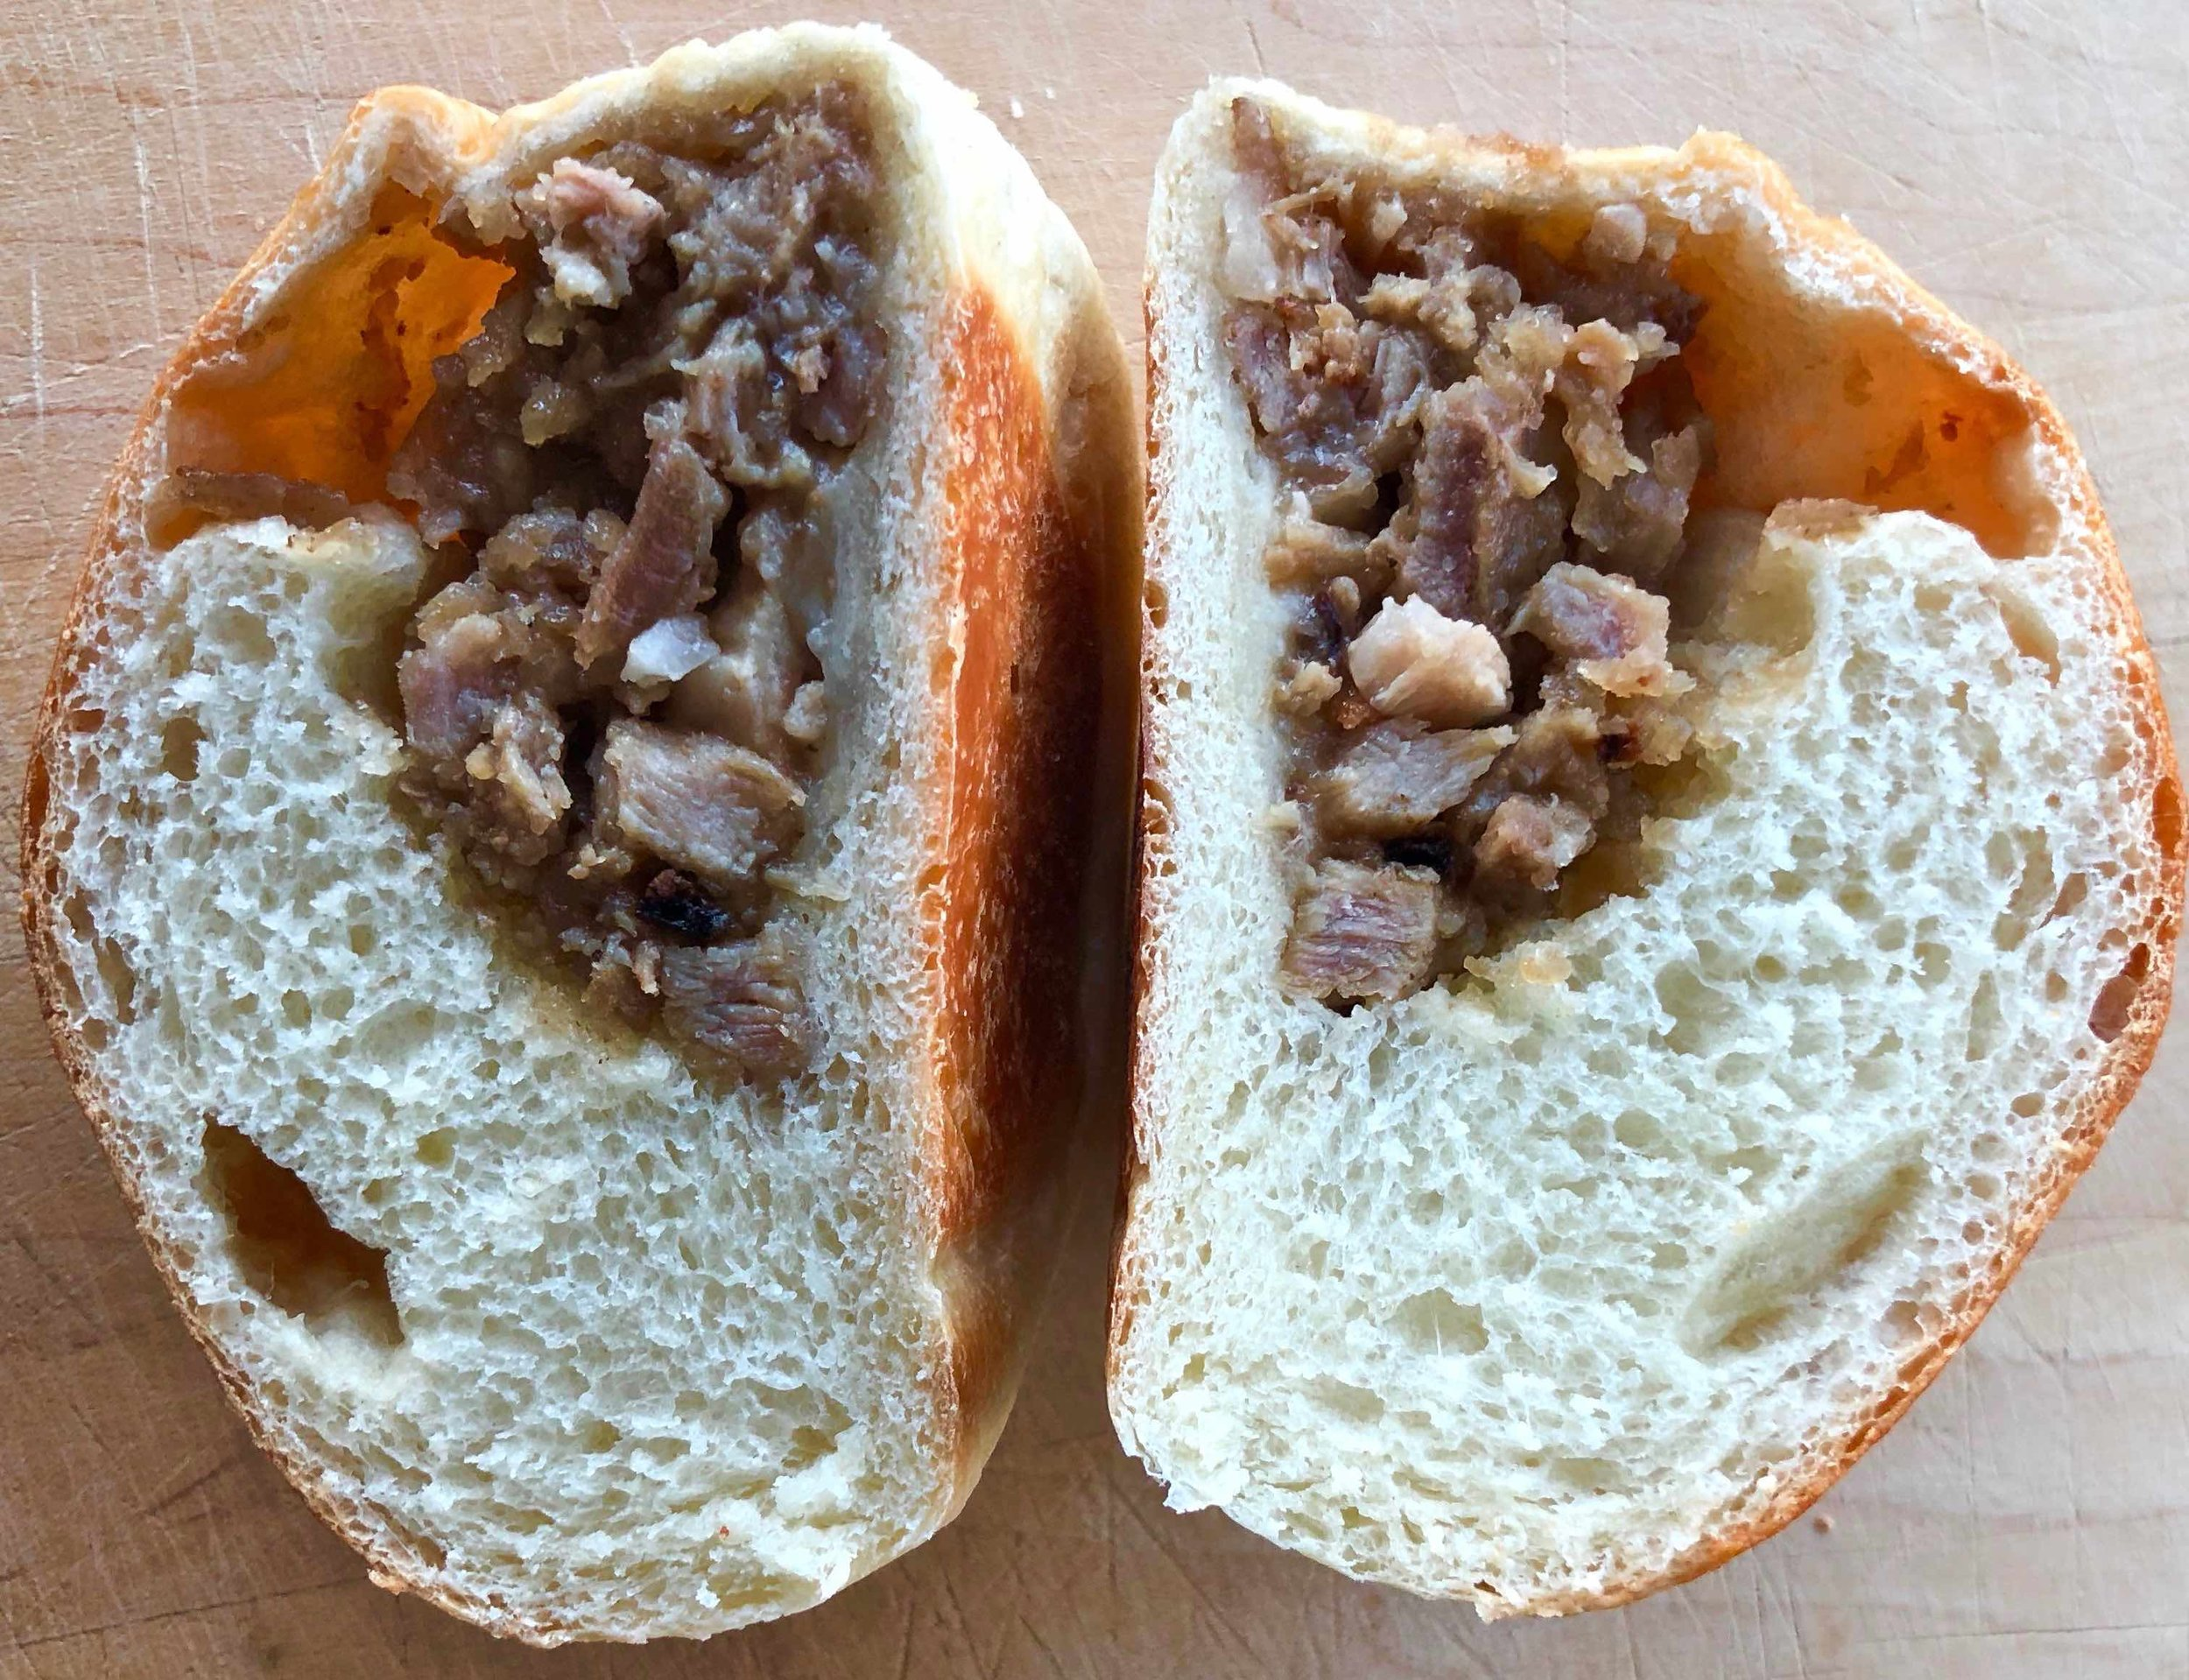 inside a baked pork bun